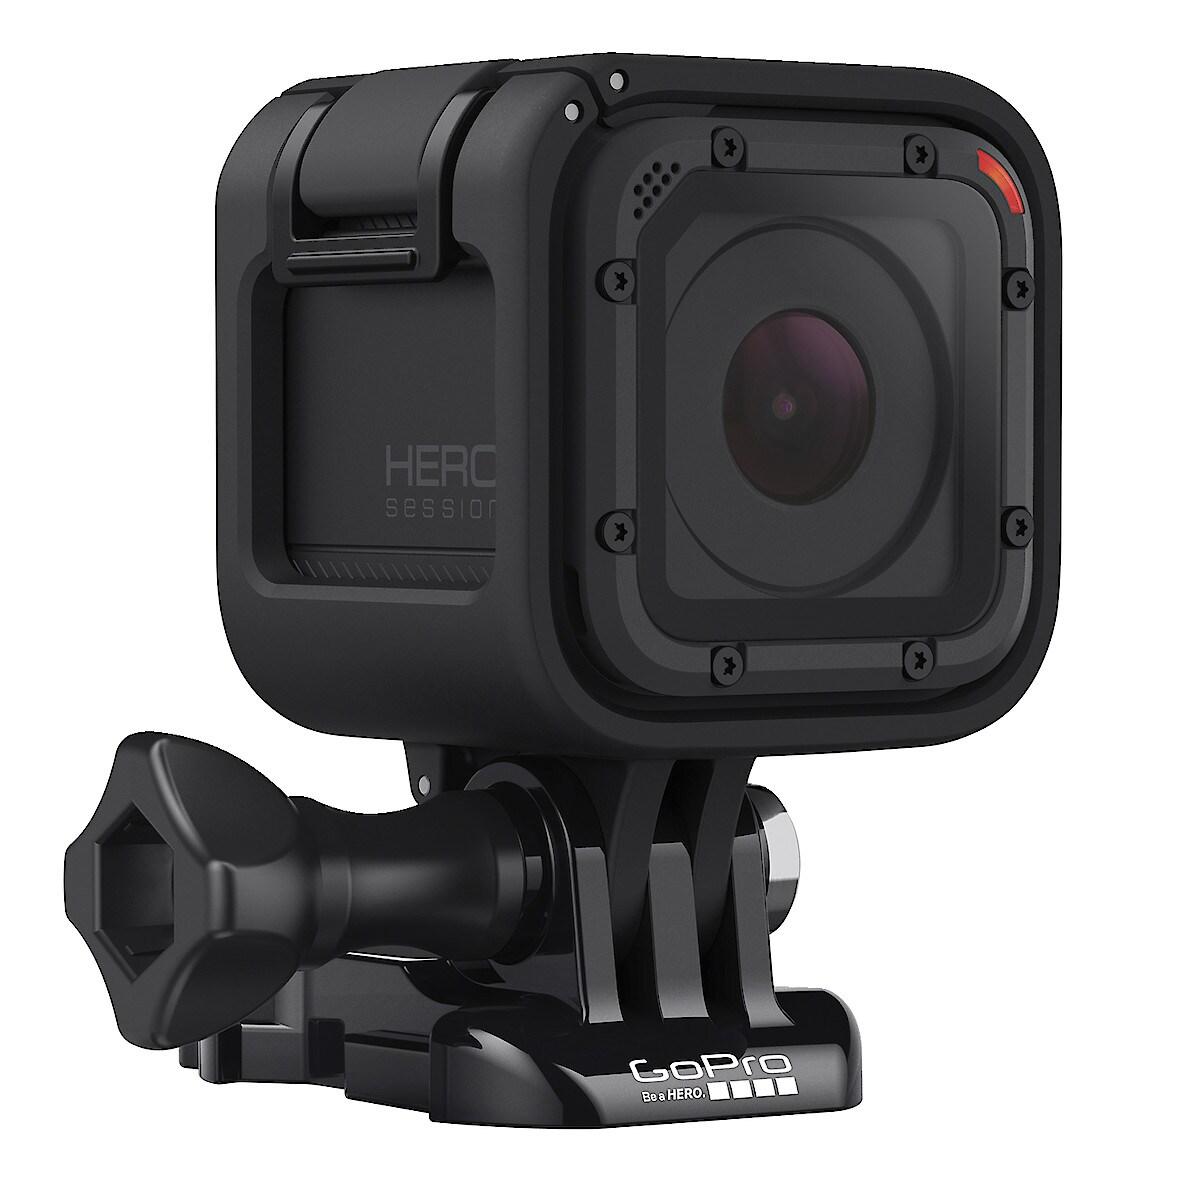 Actionkamera GoPro Hero Session